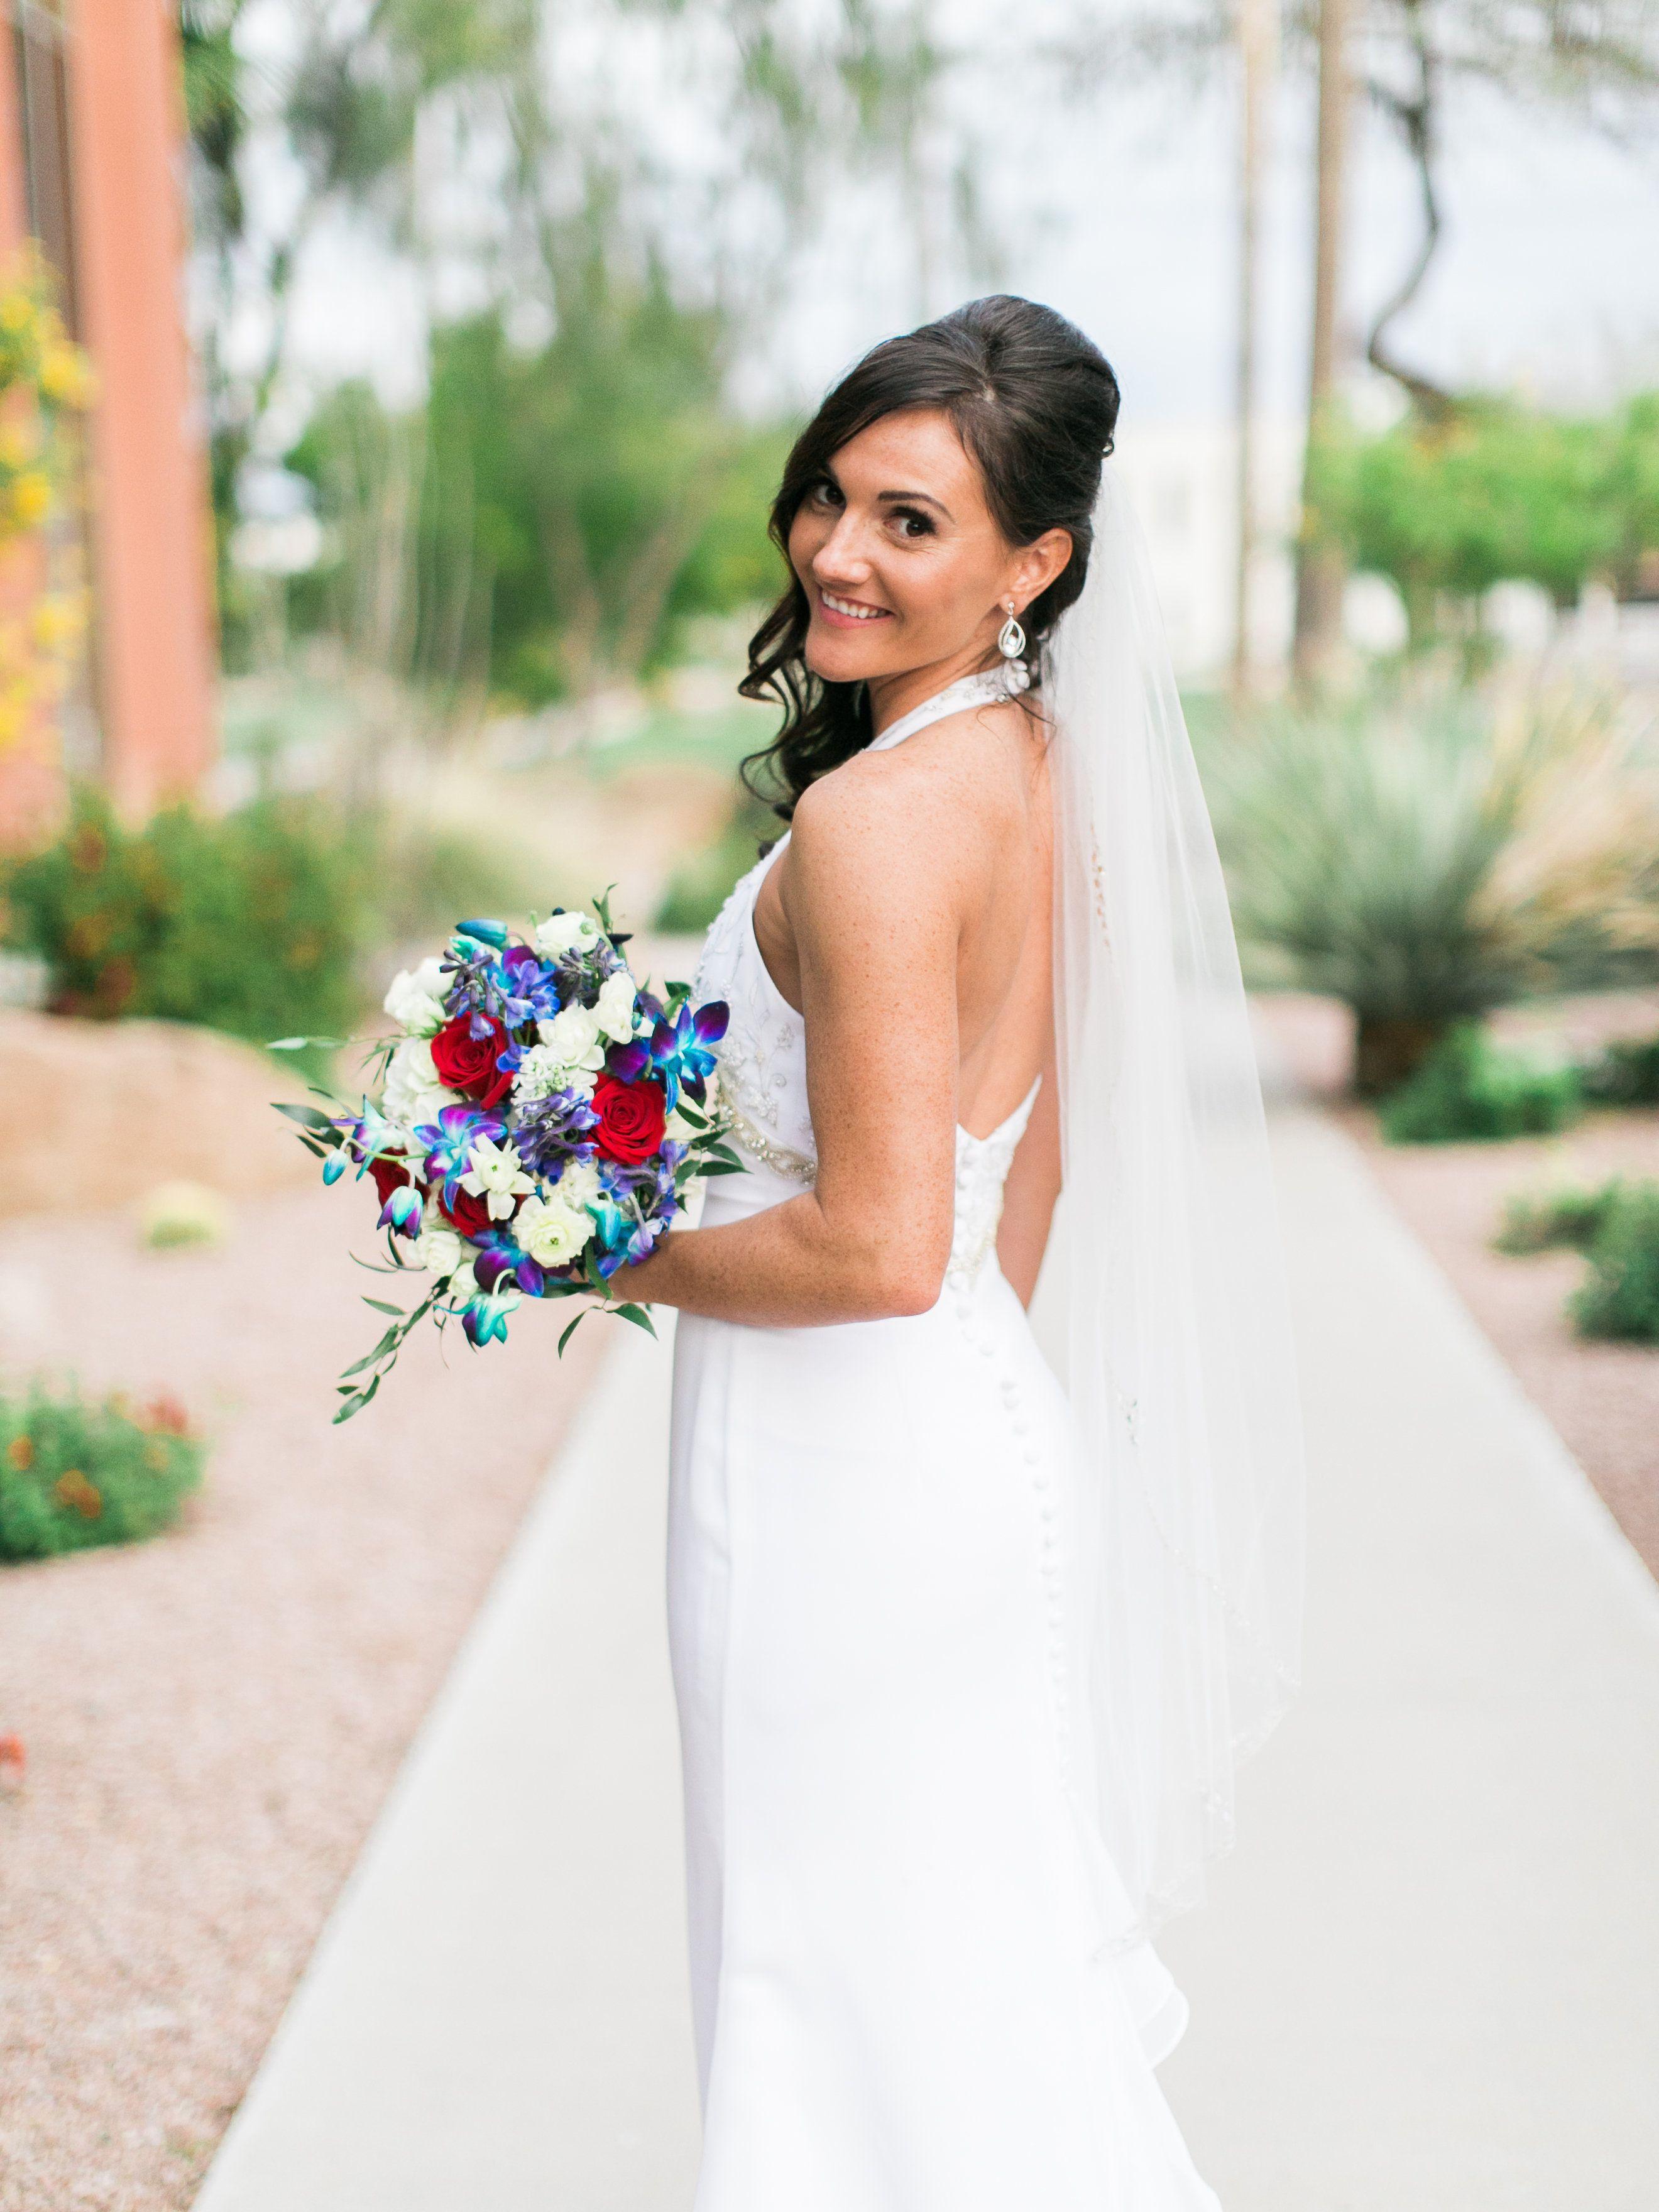 What a bride #soho63 #azwedding #weddingvenueinaz #weddingdress